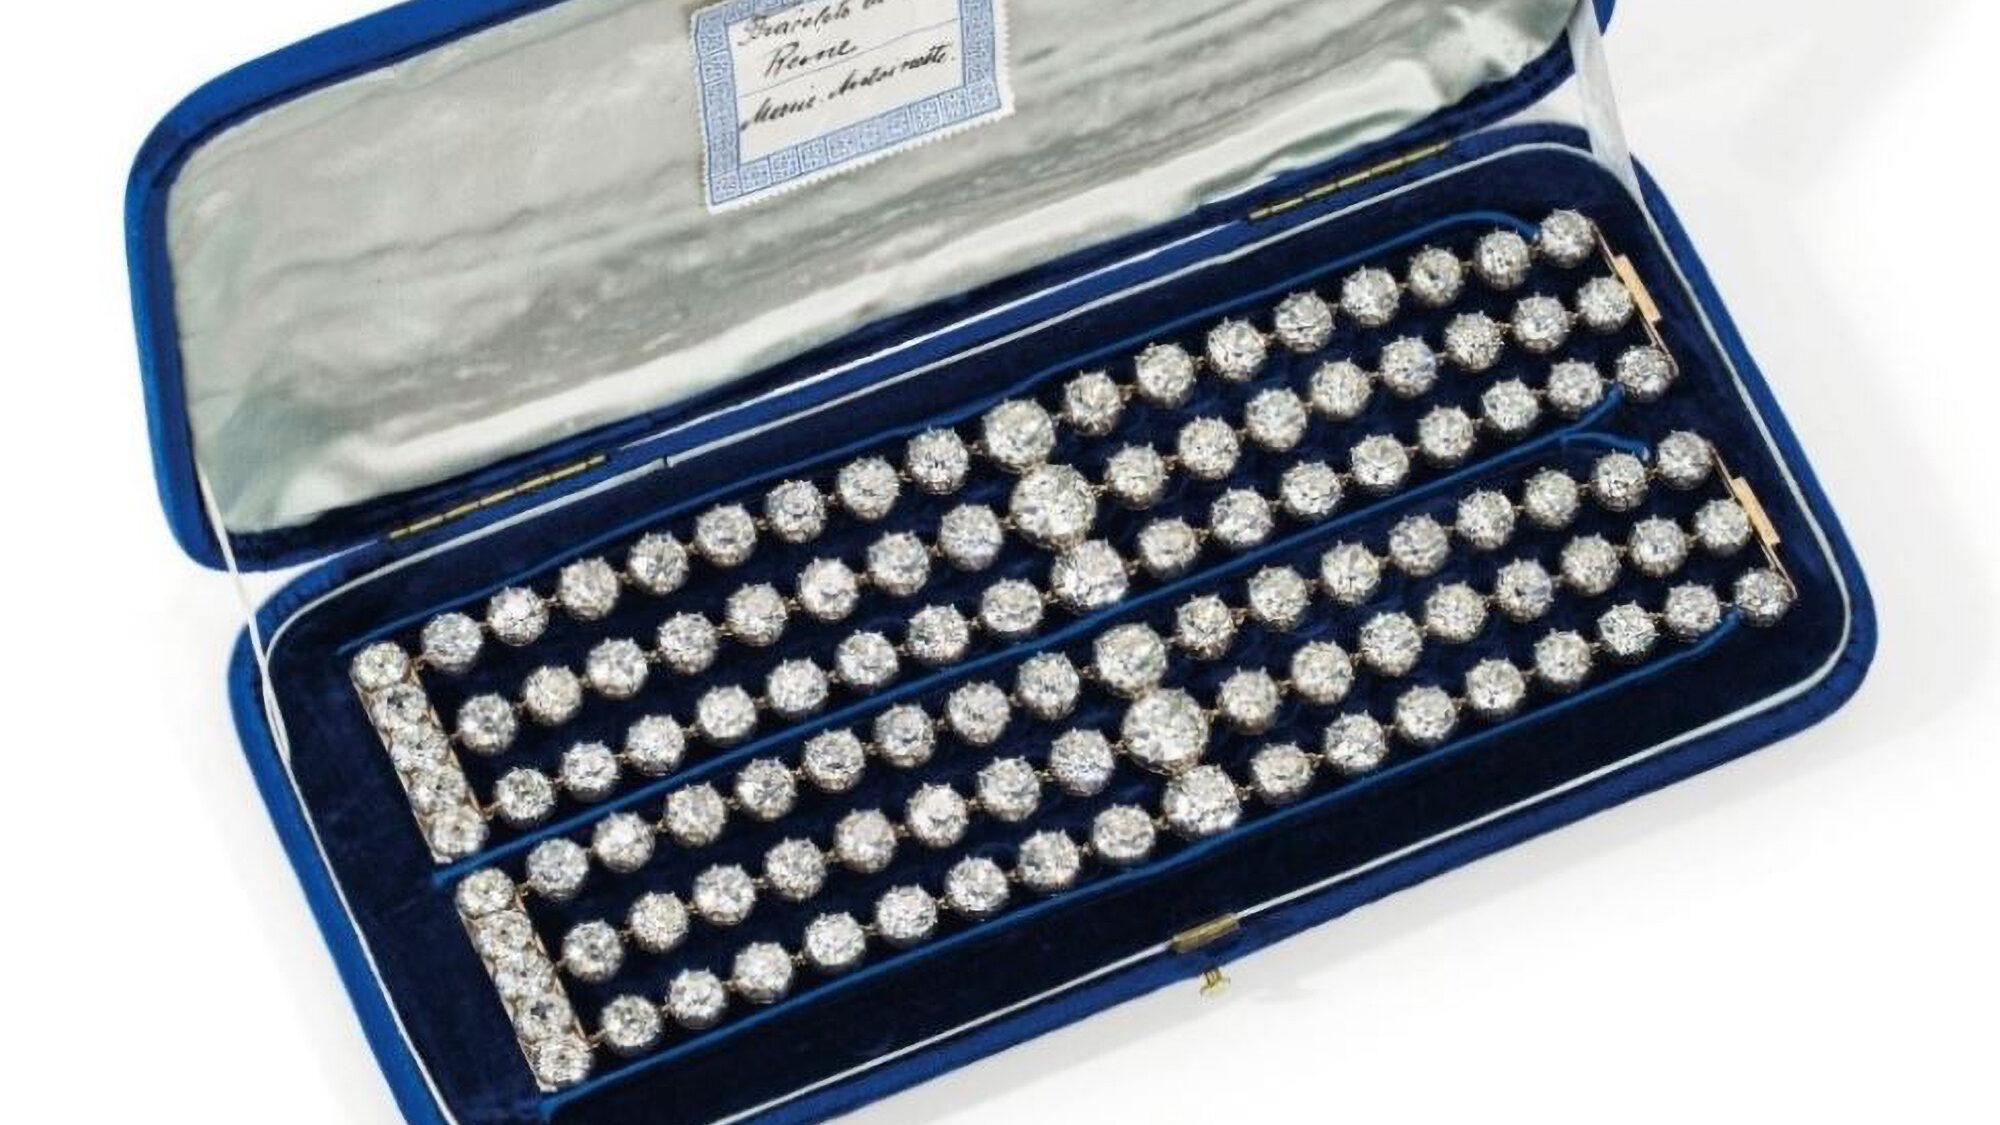 Off With Her Gems: Doomed Marie Antoinette's $4 Million Diamonds To Go Under The Hammer